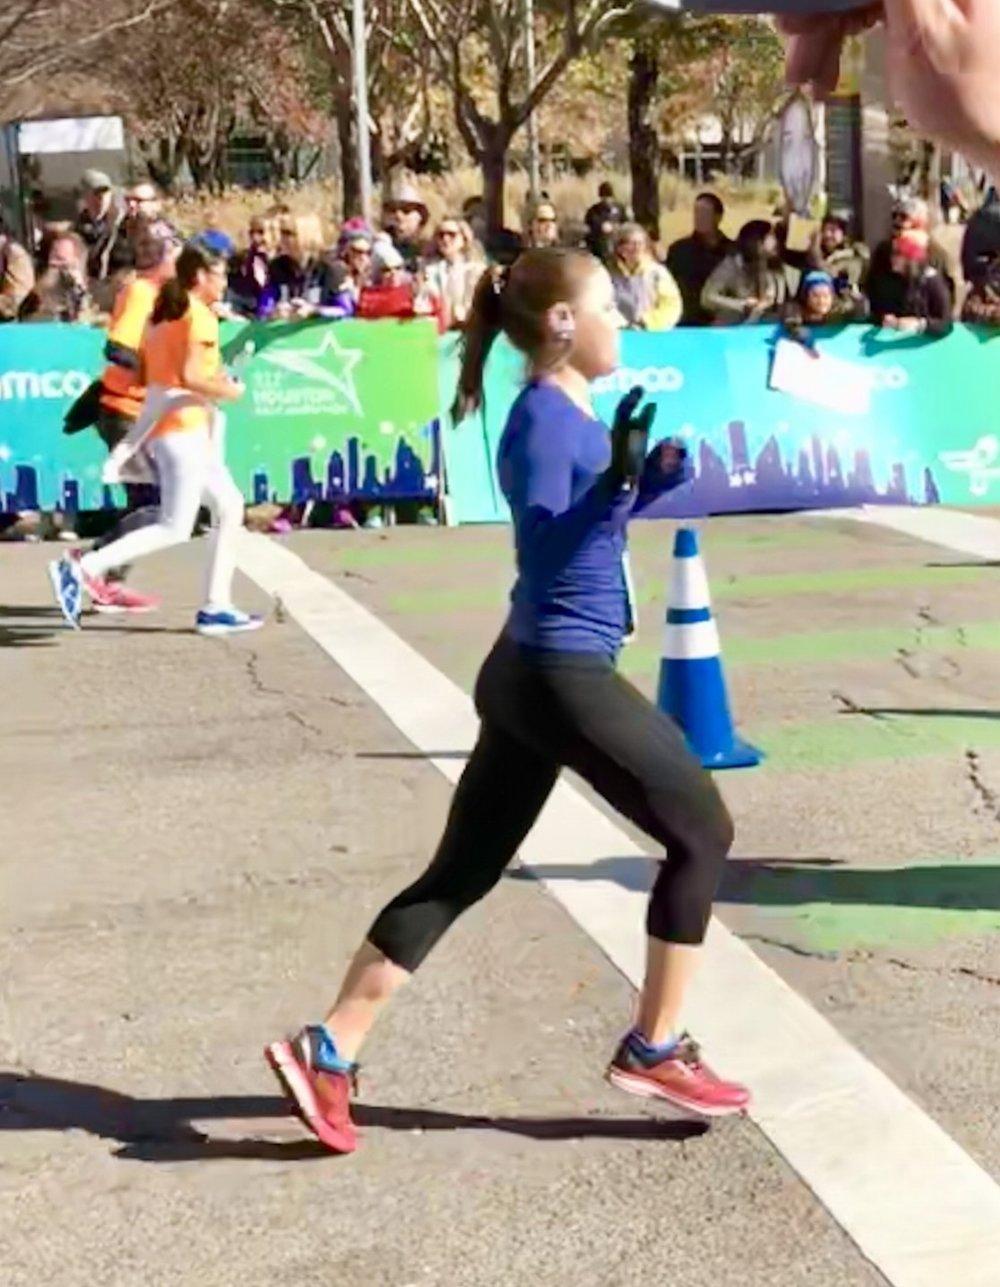 Krista crossing the finish line at the Houston Marathon 2018